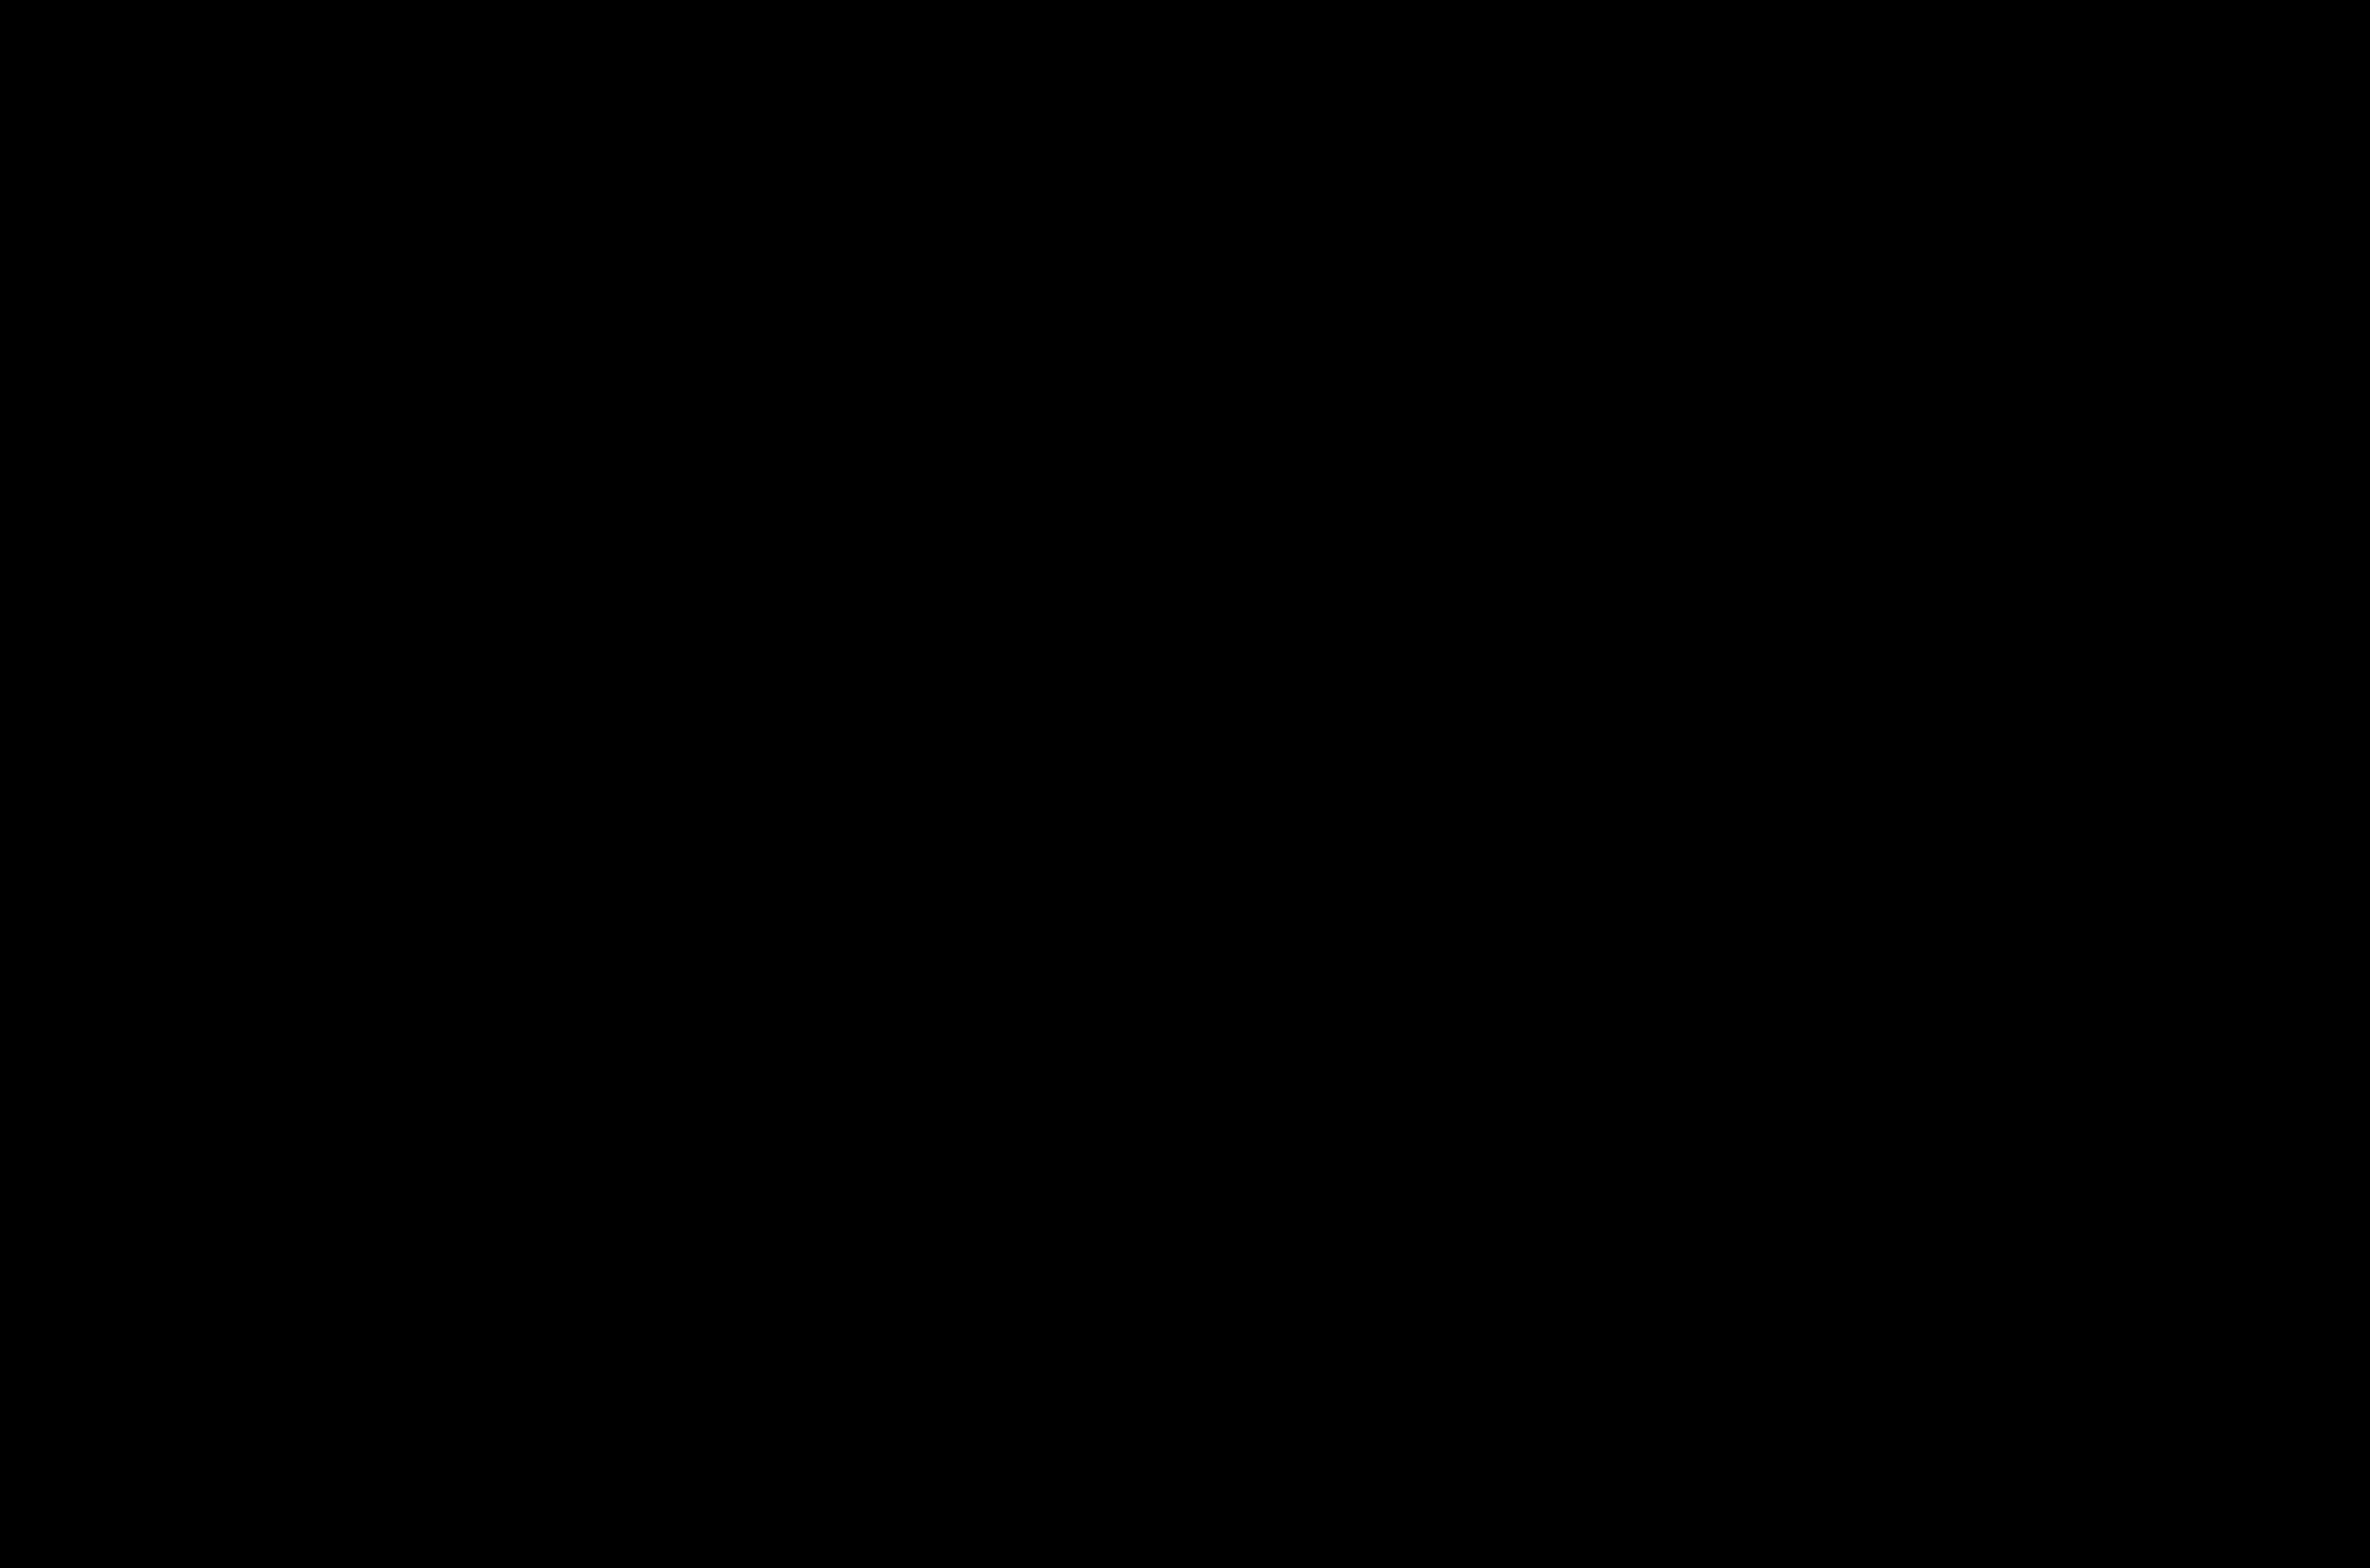 mtv logo 1 - MTV Logo